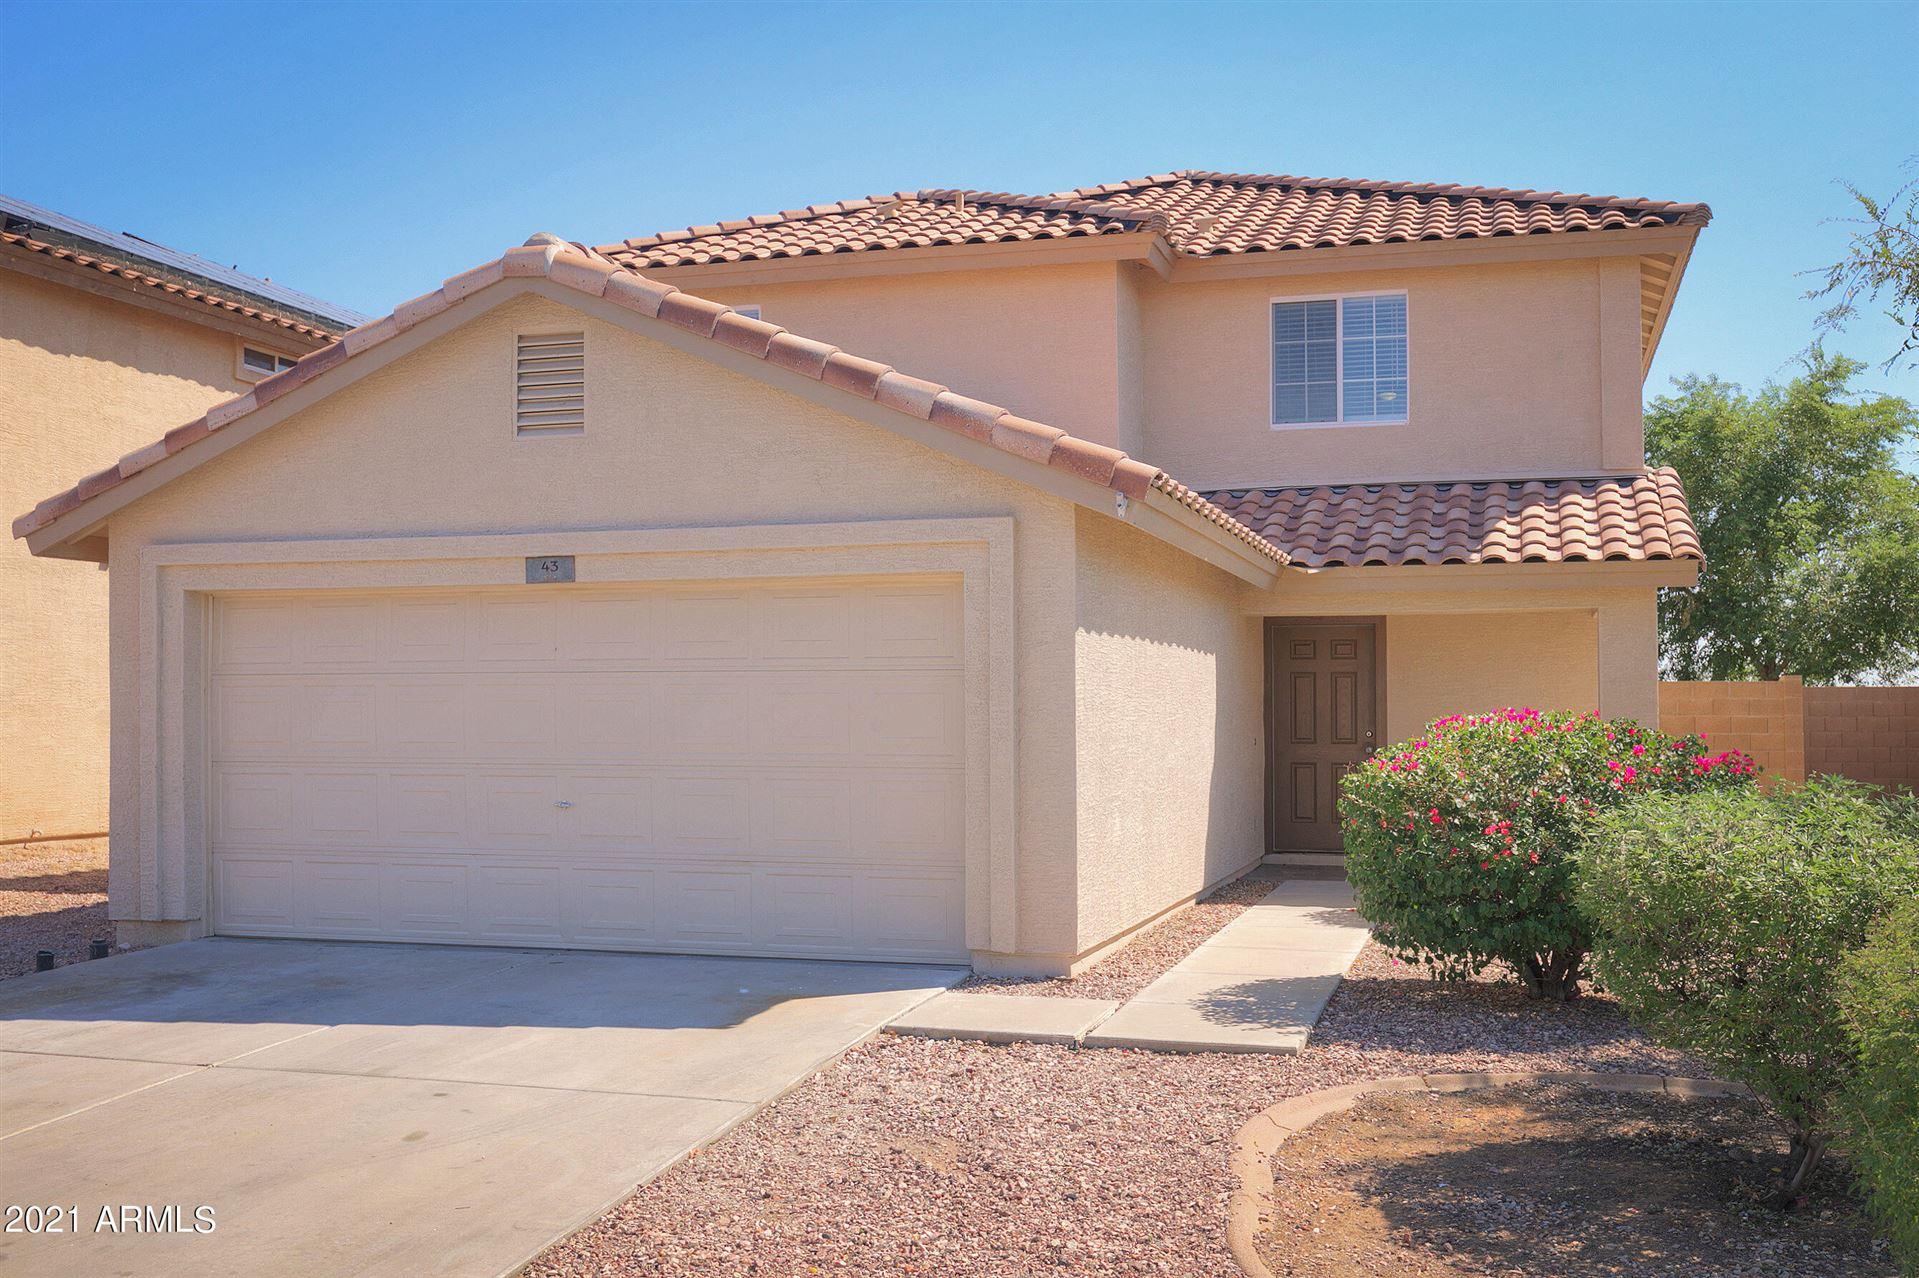 Photo of 43 N 219TH Drive, Buckeye, AZ 85326 (MLS # 6296309)